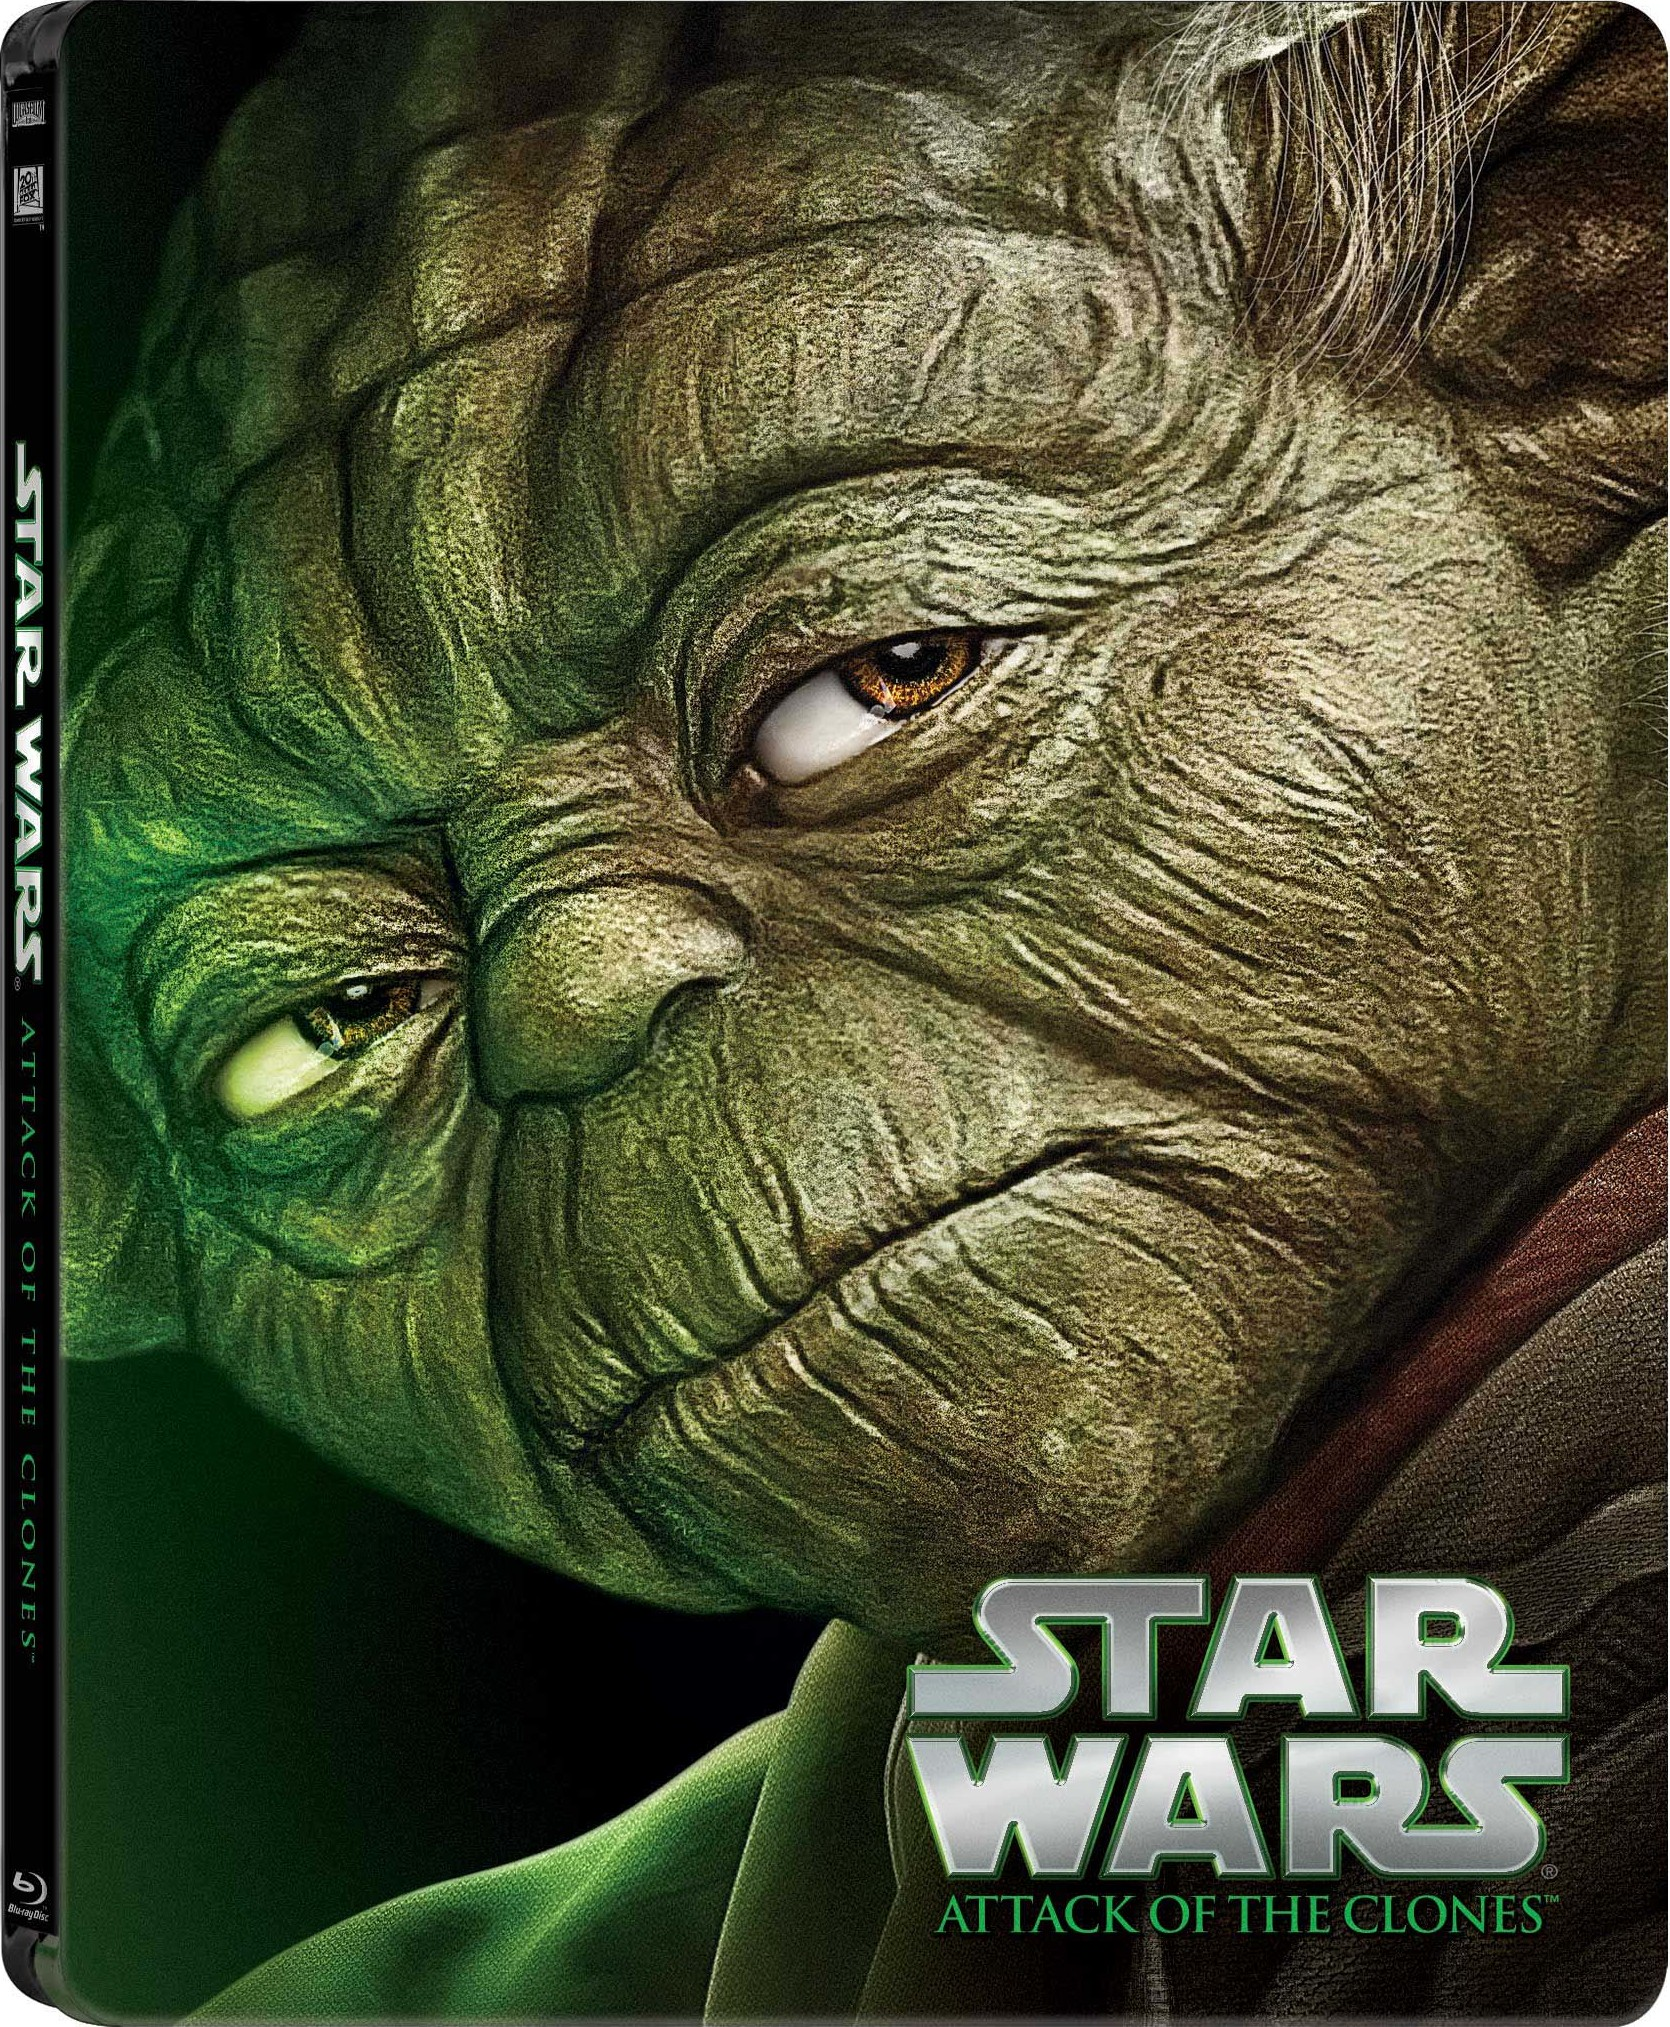 Star Wars Attack of the Clones SteelBook